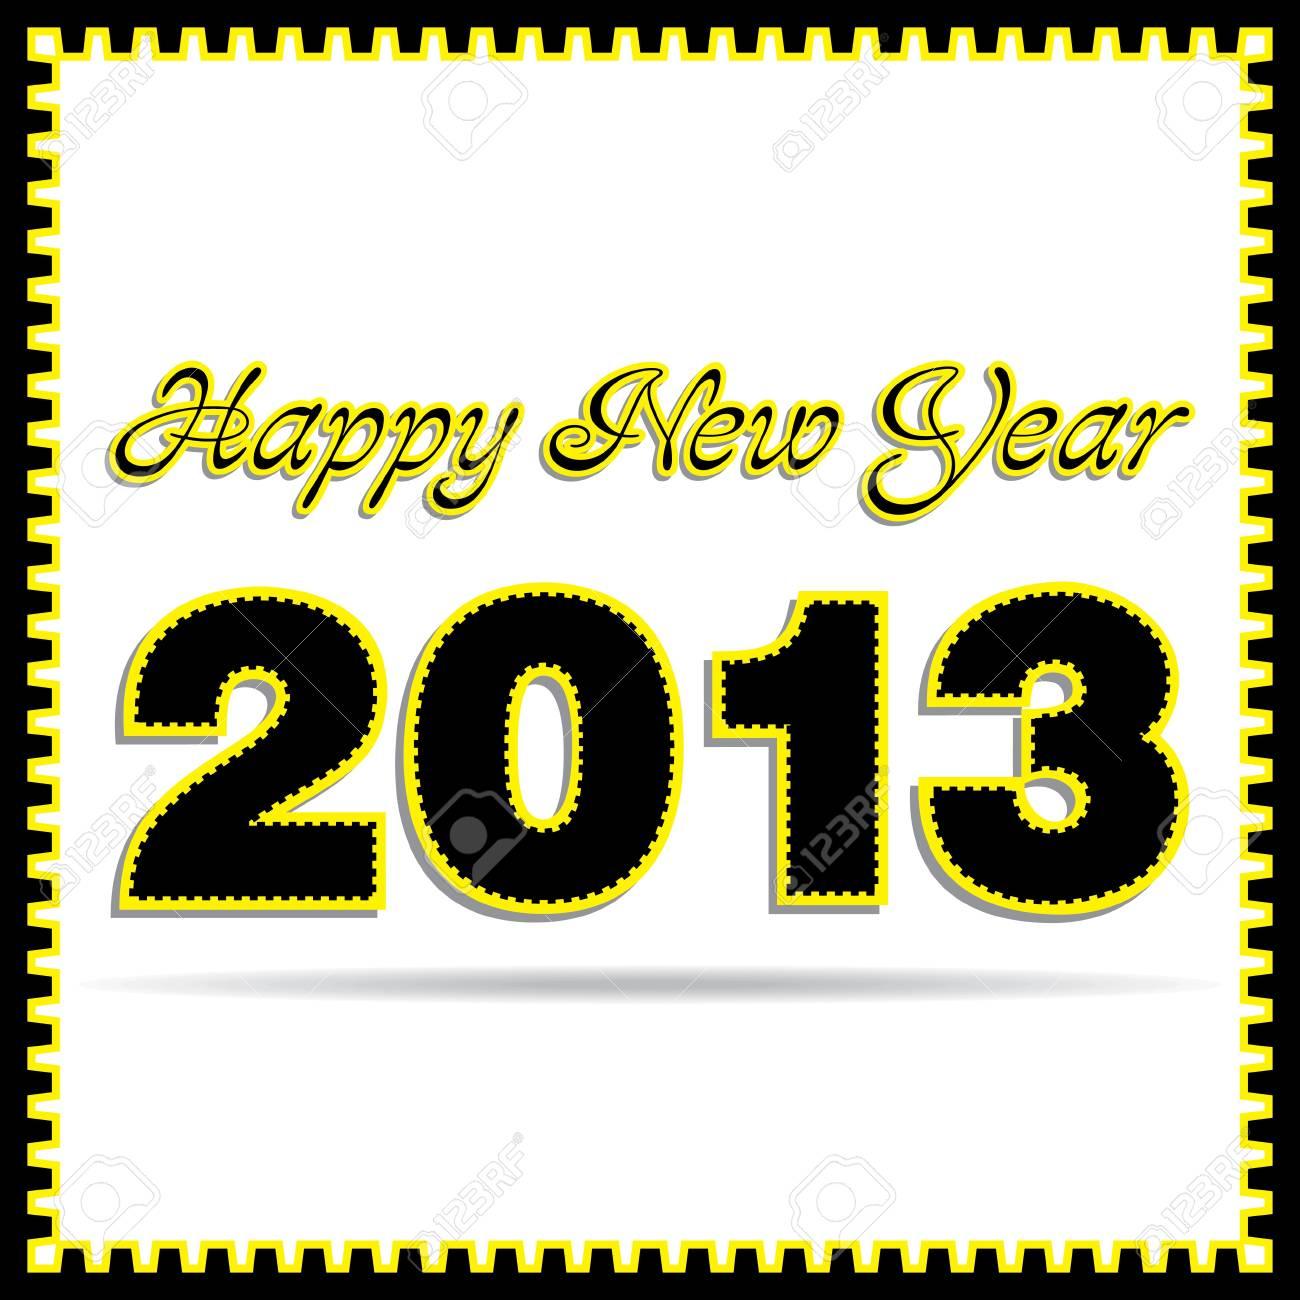 new year 2013 stock vector Stock Vector - 16845611